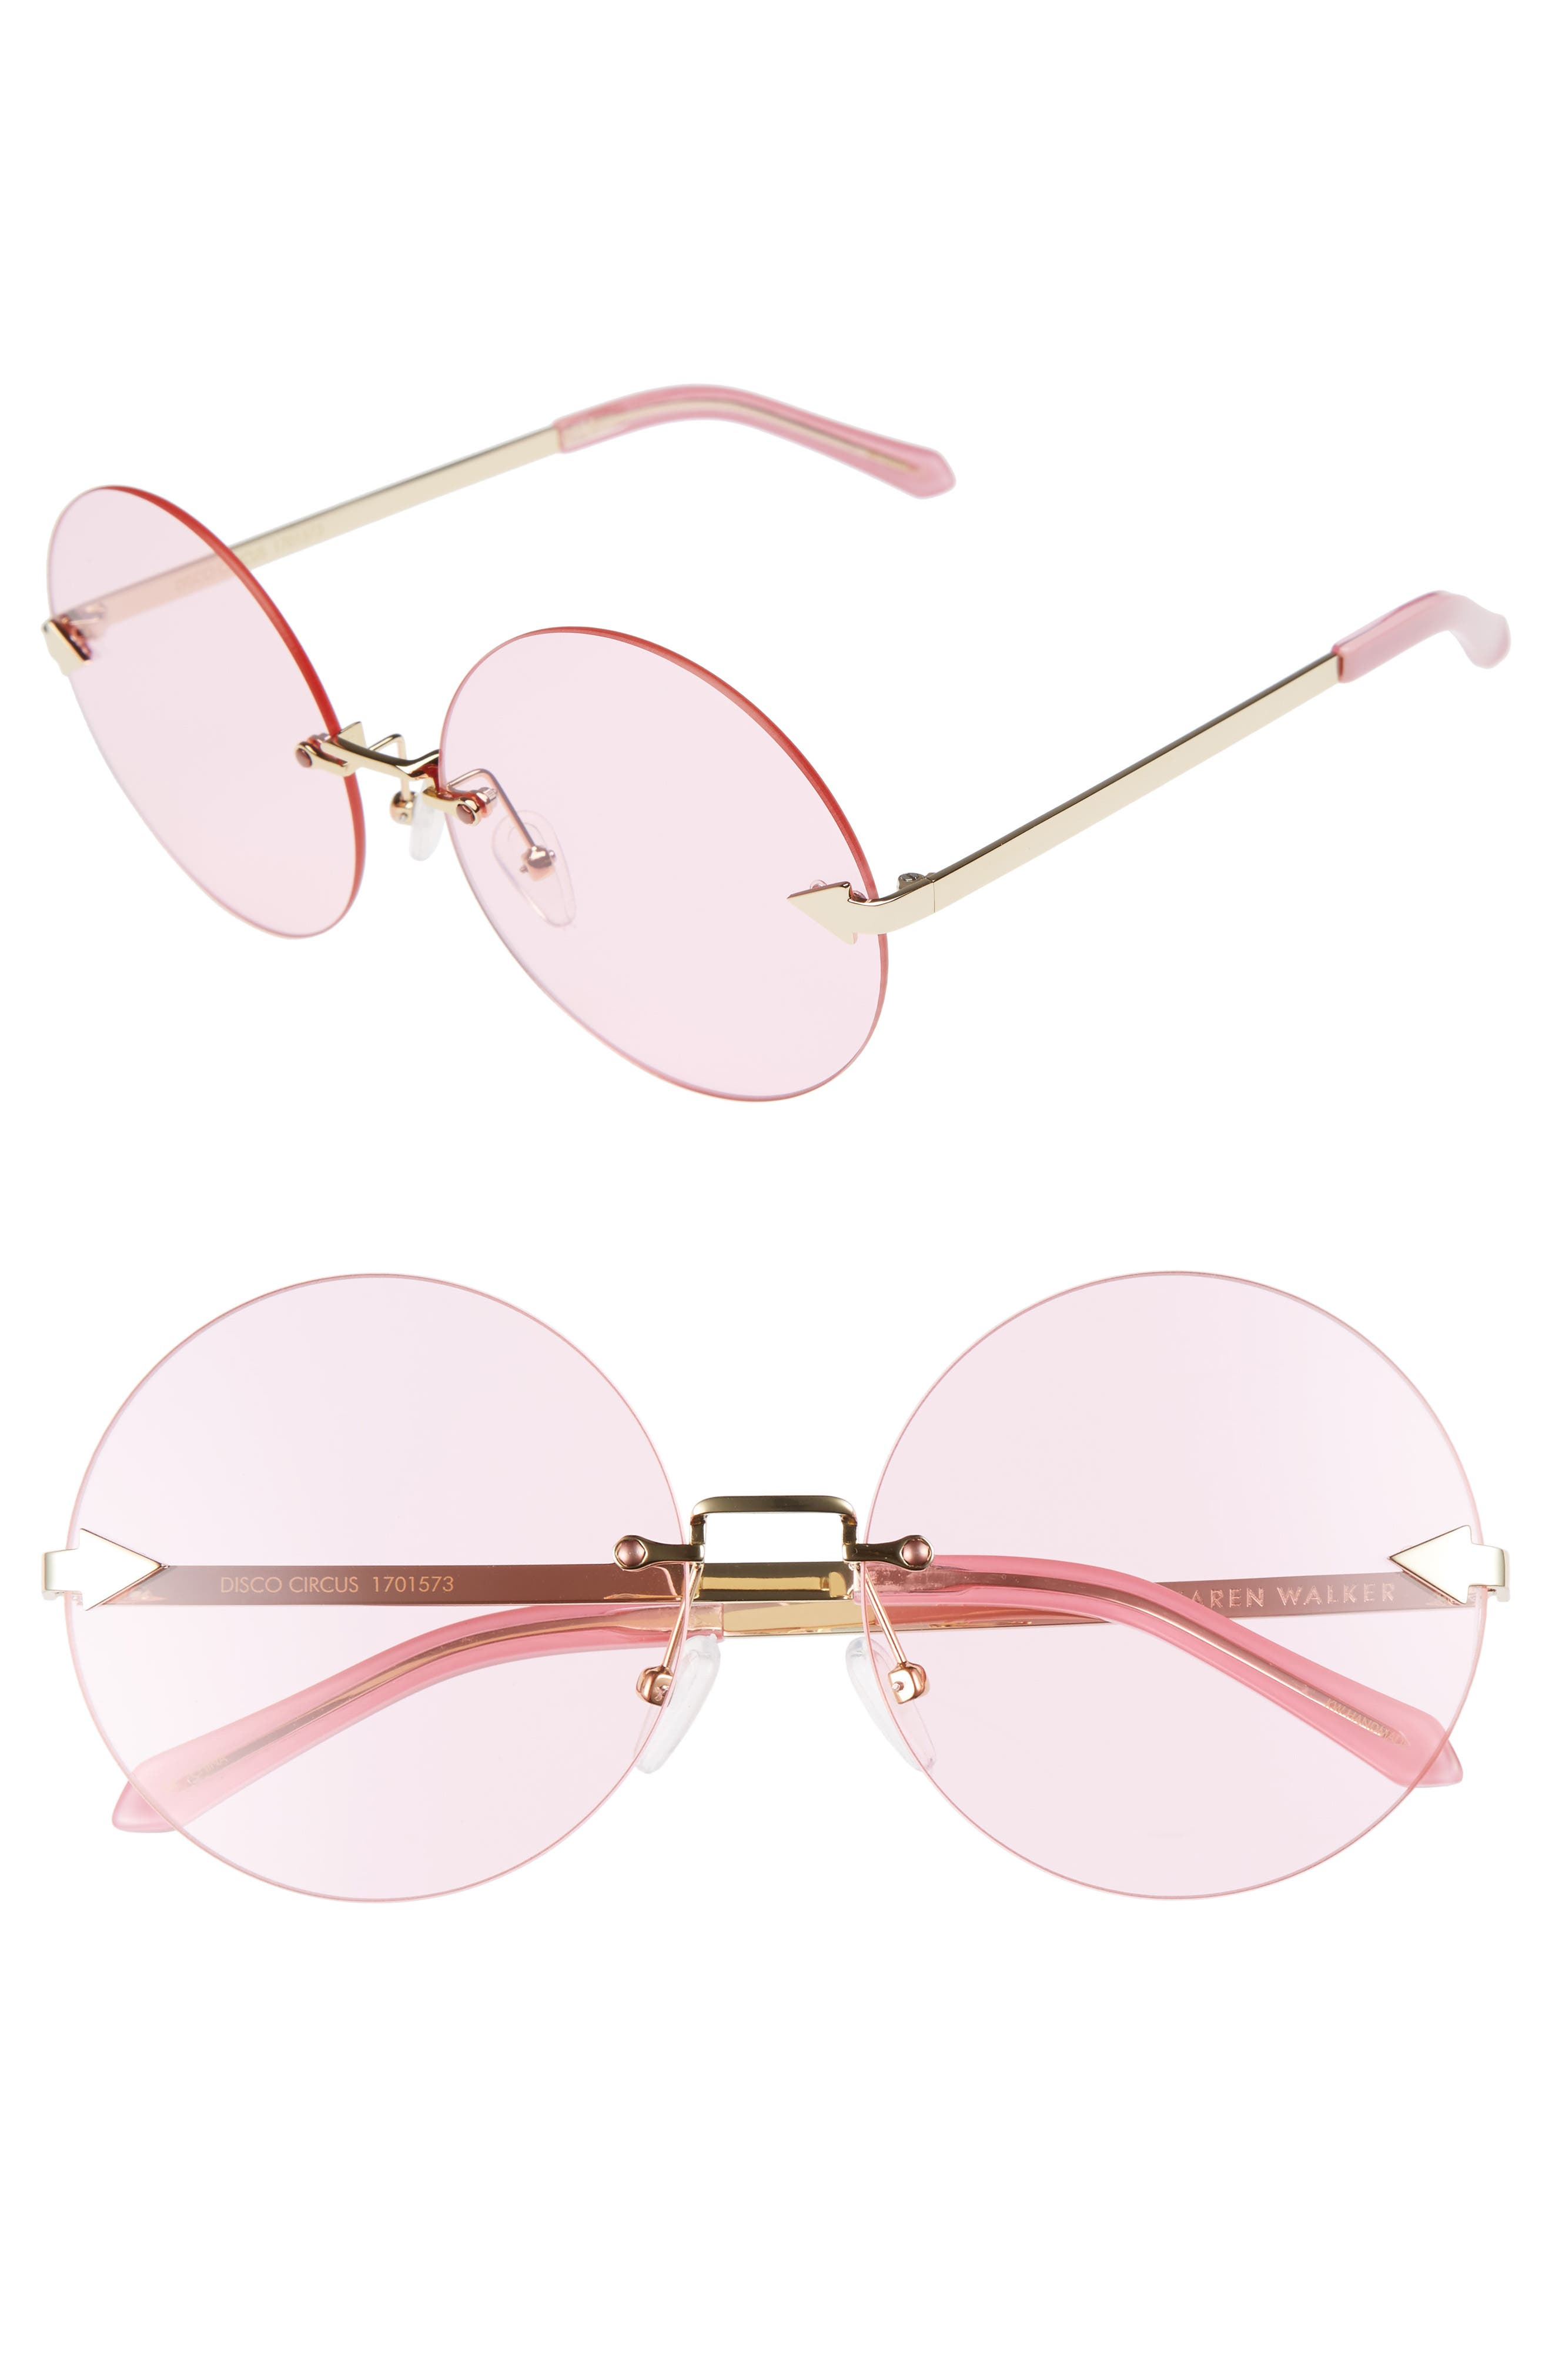 Disco Circus 60mm Rimless Round Sunglasses,                             Main thumbnail 3, color,